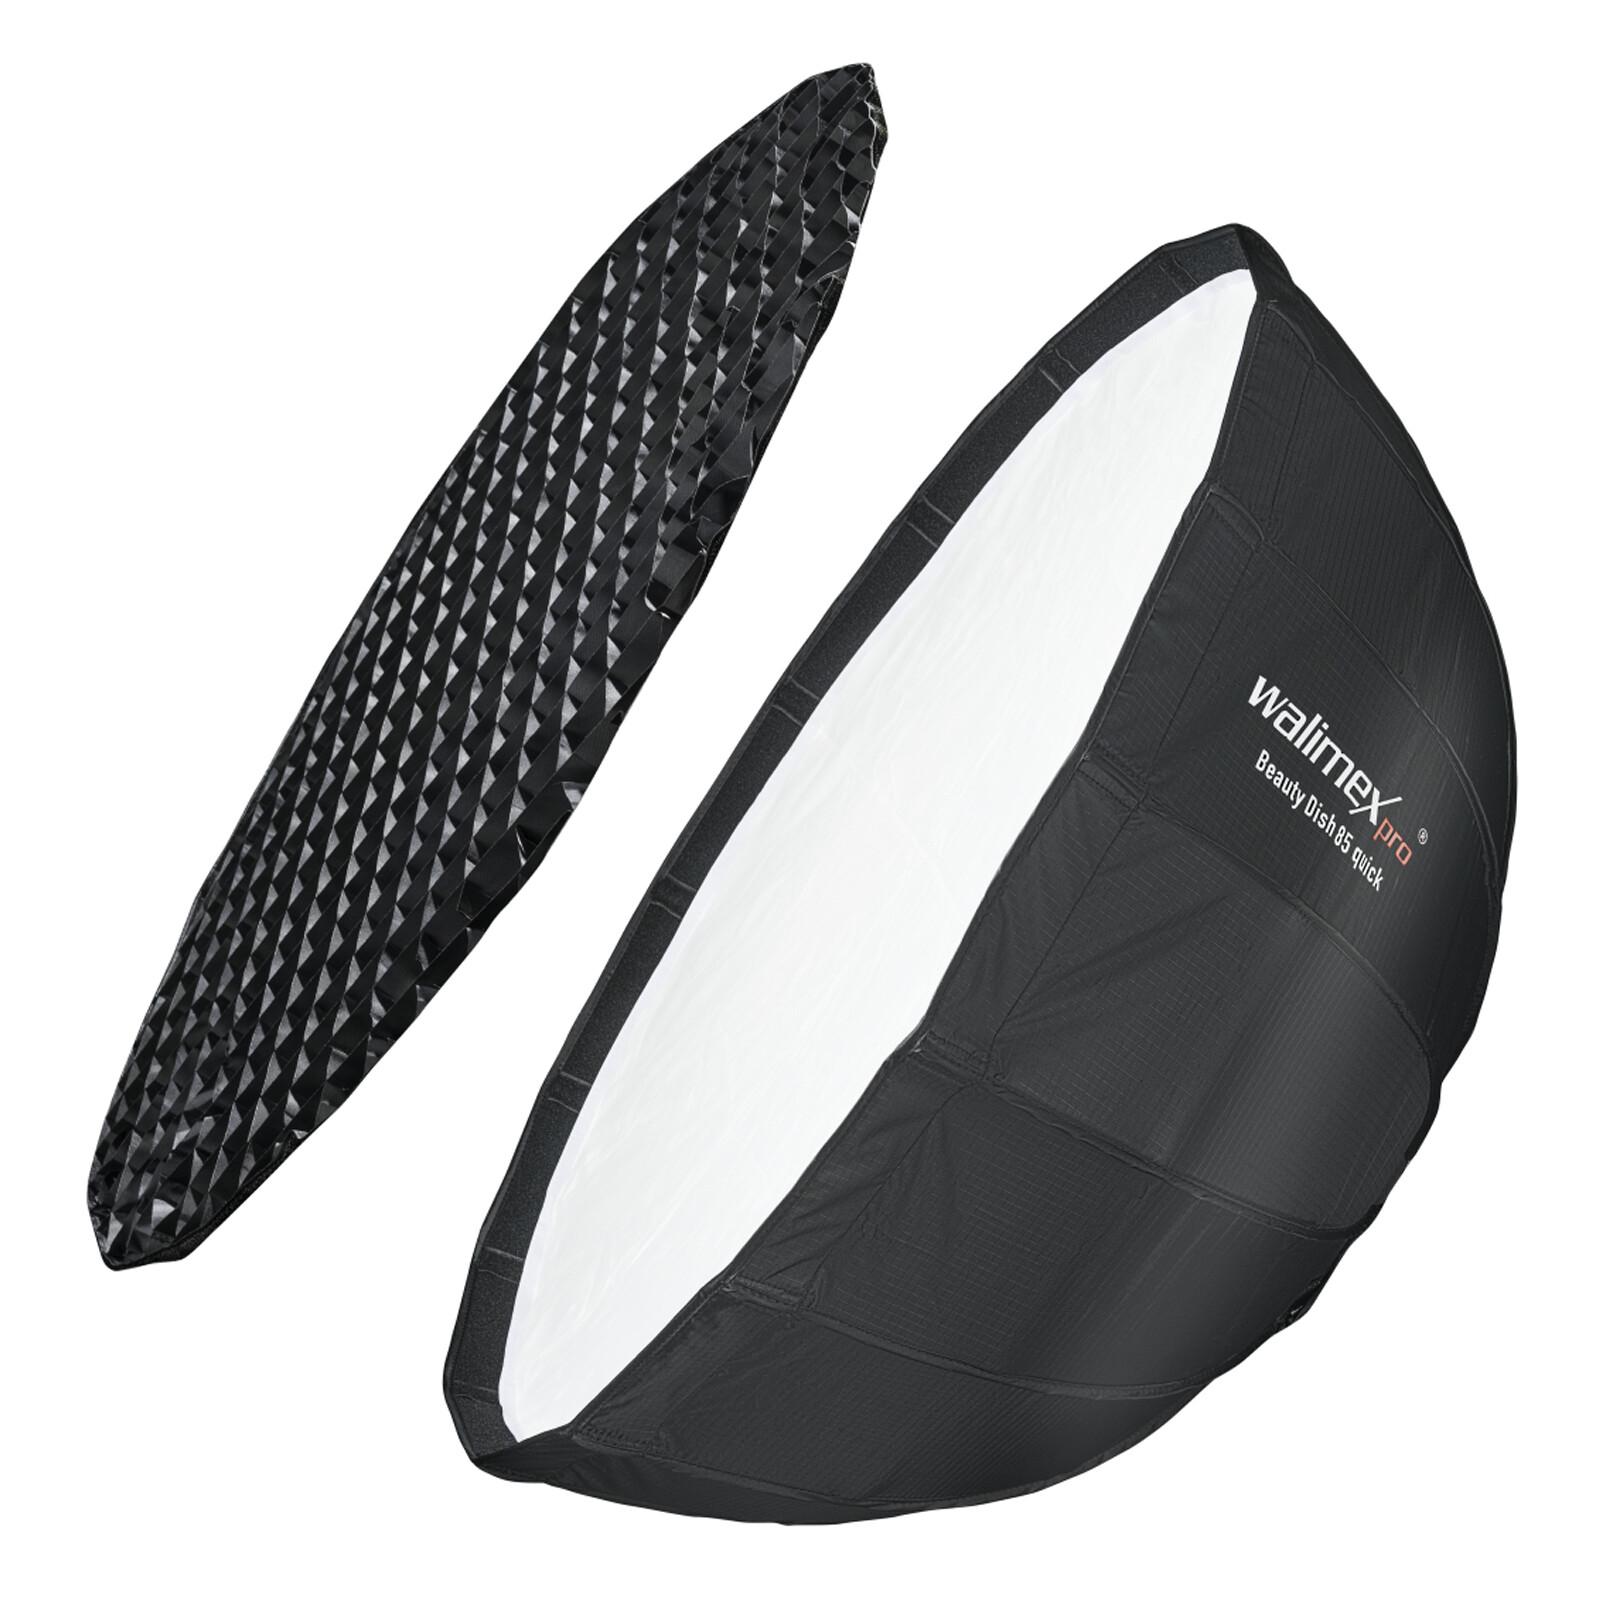 Walimex pro Studio Line Beauty Dish Softbox QA85 Walimex C&C